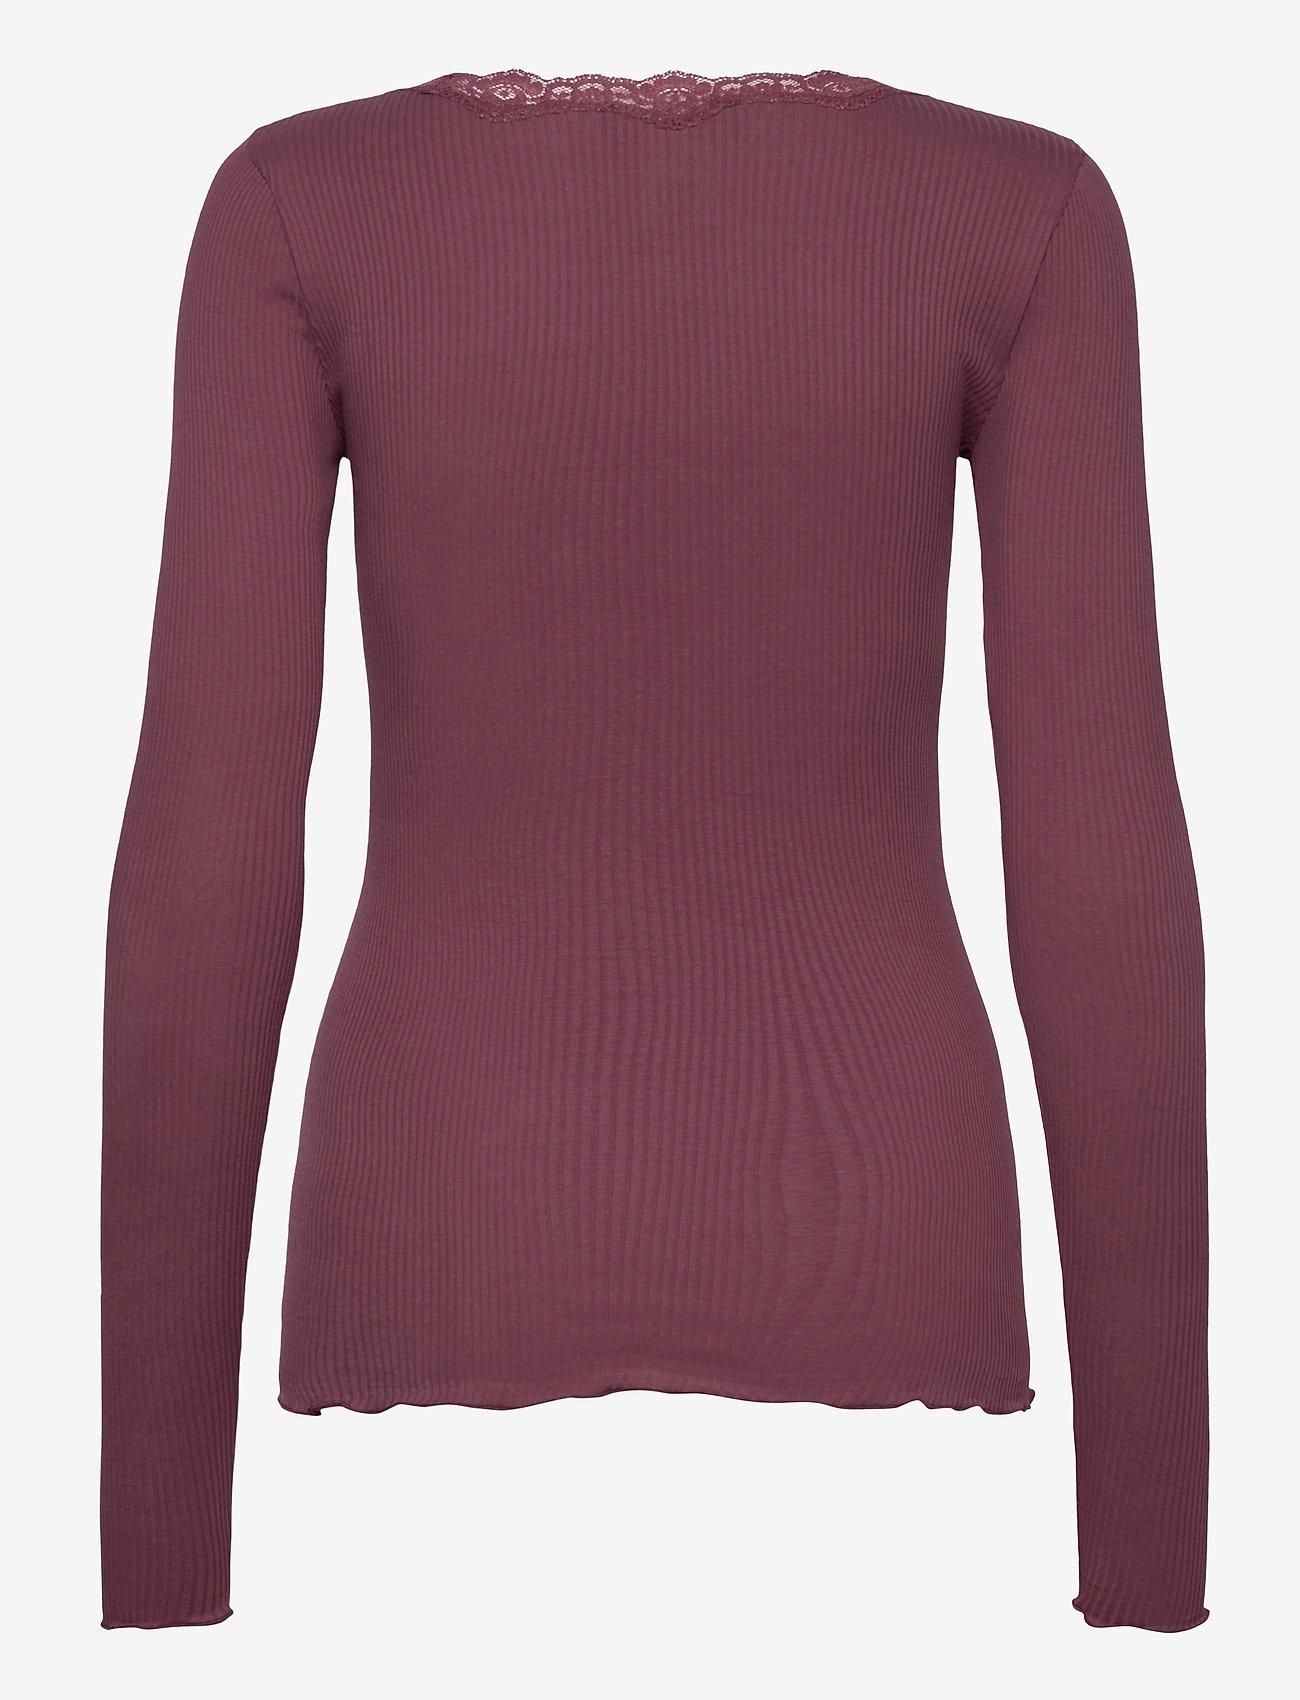 Rosemunde - Organic t-shirt regular w/lace - långärmade toppar - grape - 1